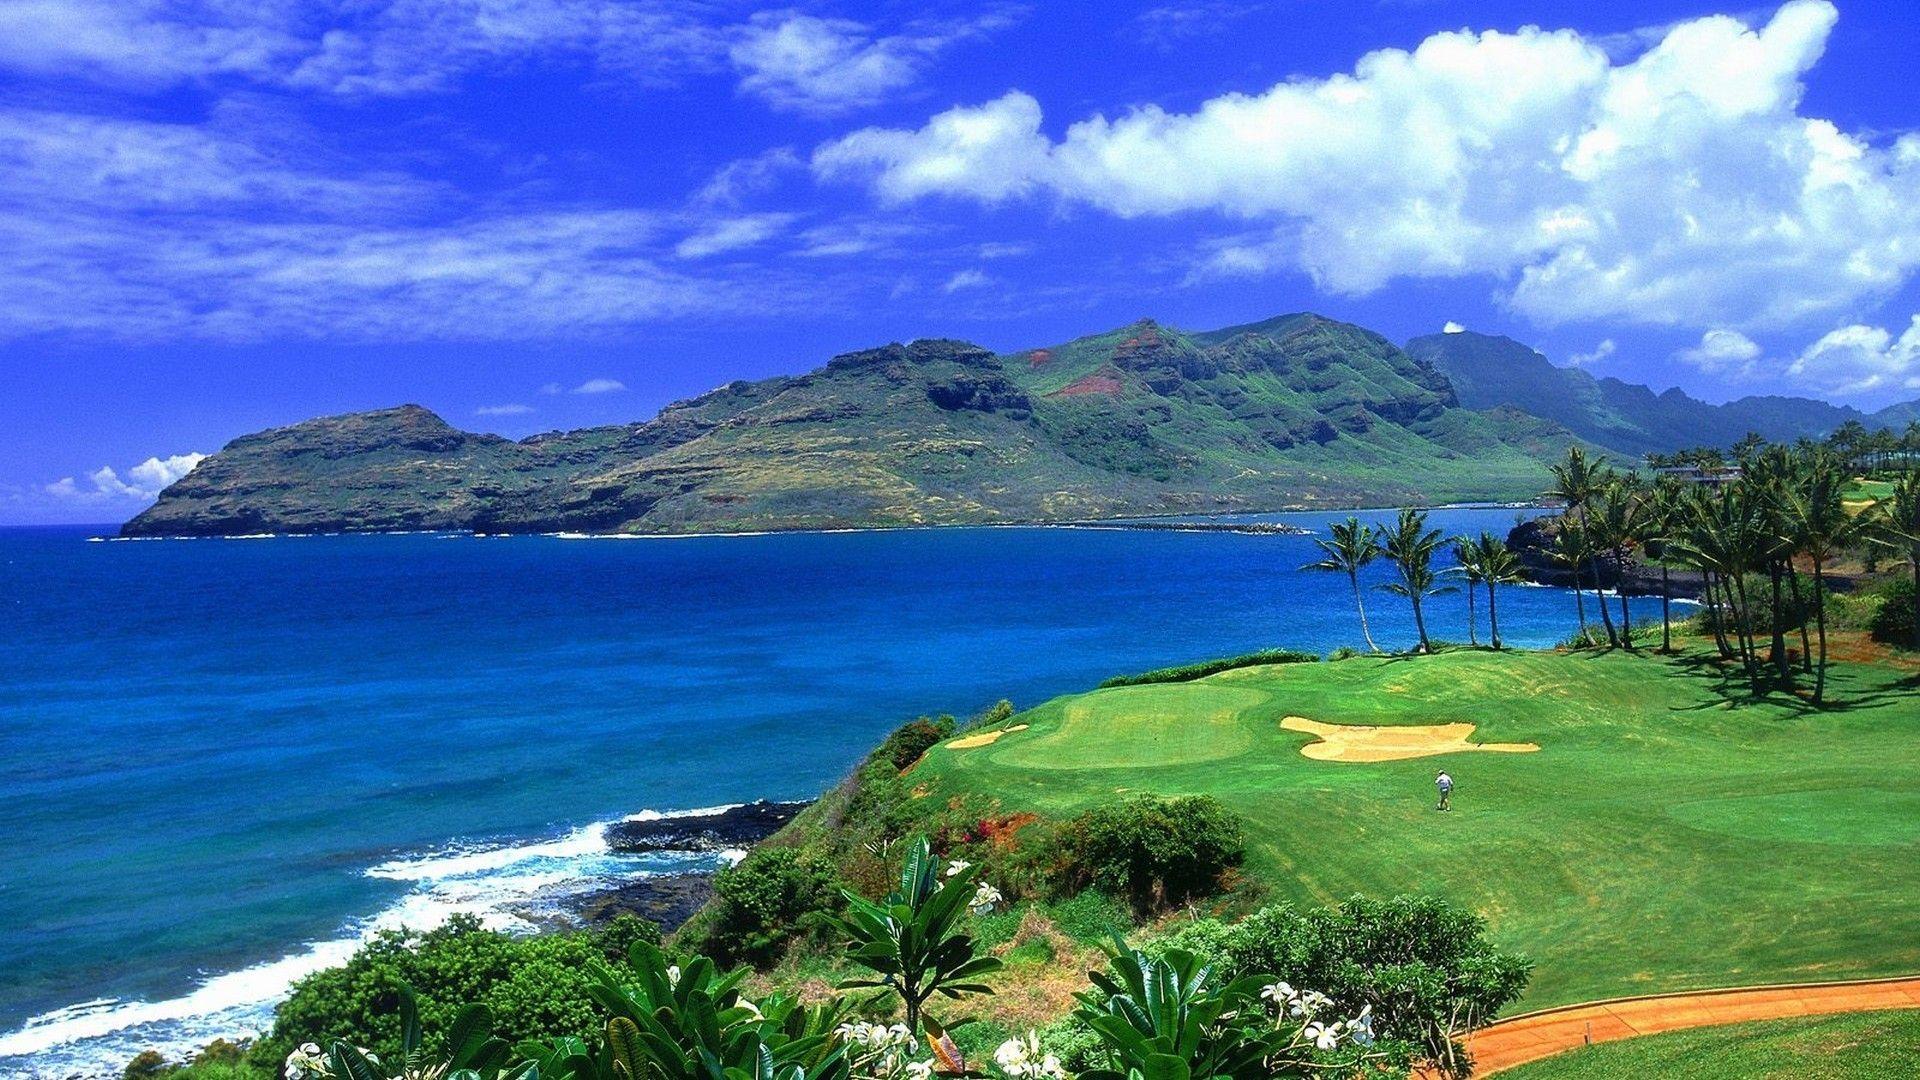 Hawaii Golf 1920x1080 Golf Via Www Allwallpaper In Com Imagens